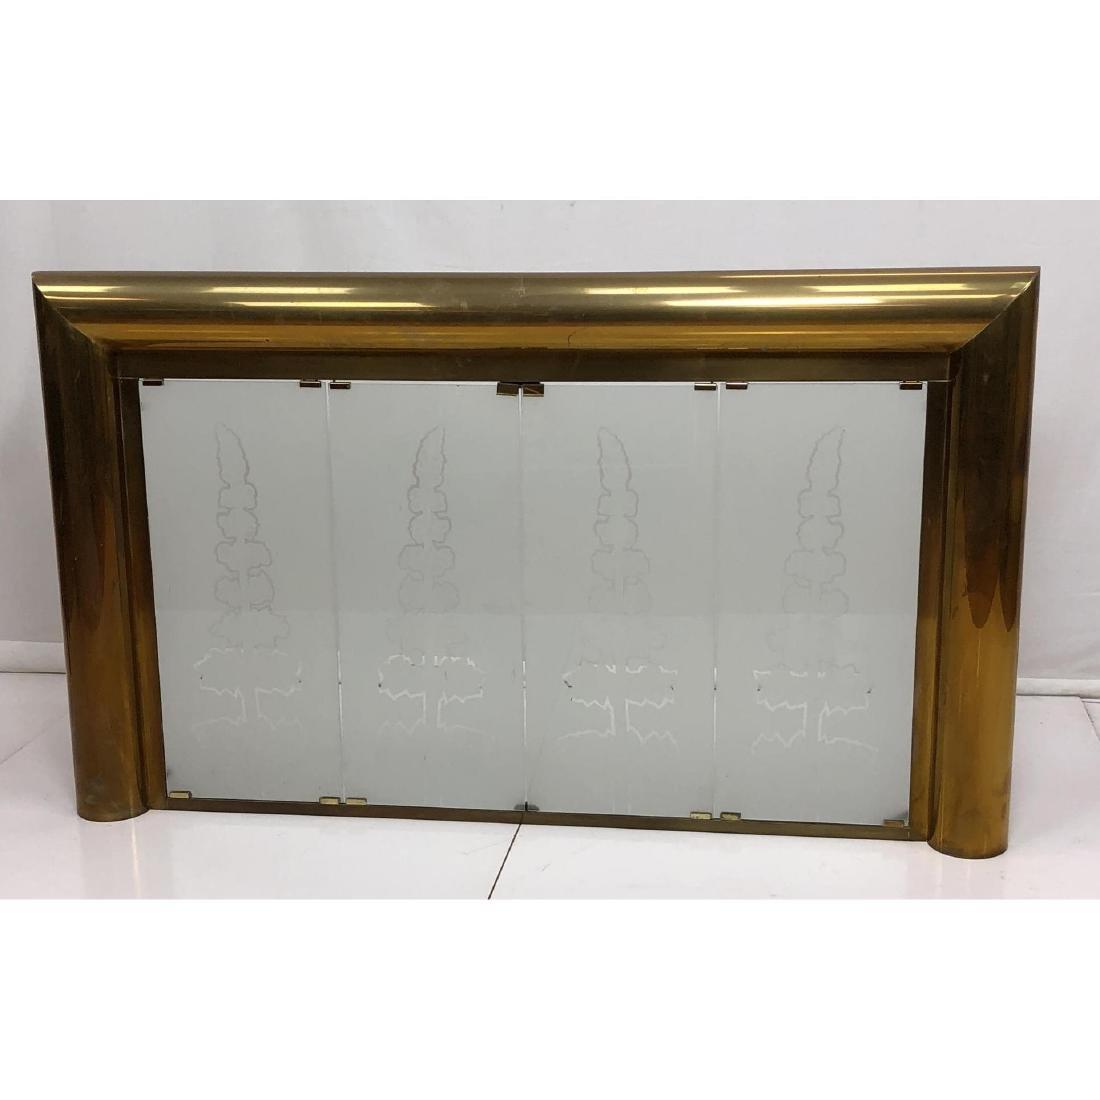 Modernist Brass Frame Oversized Fireplace Surroun